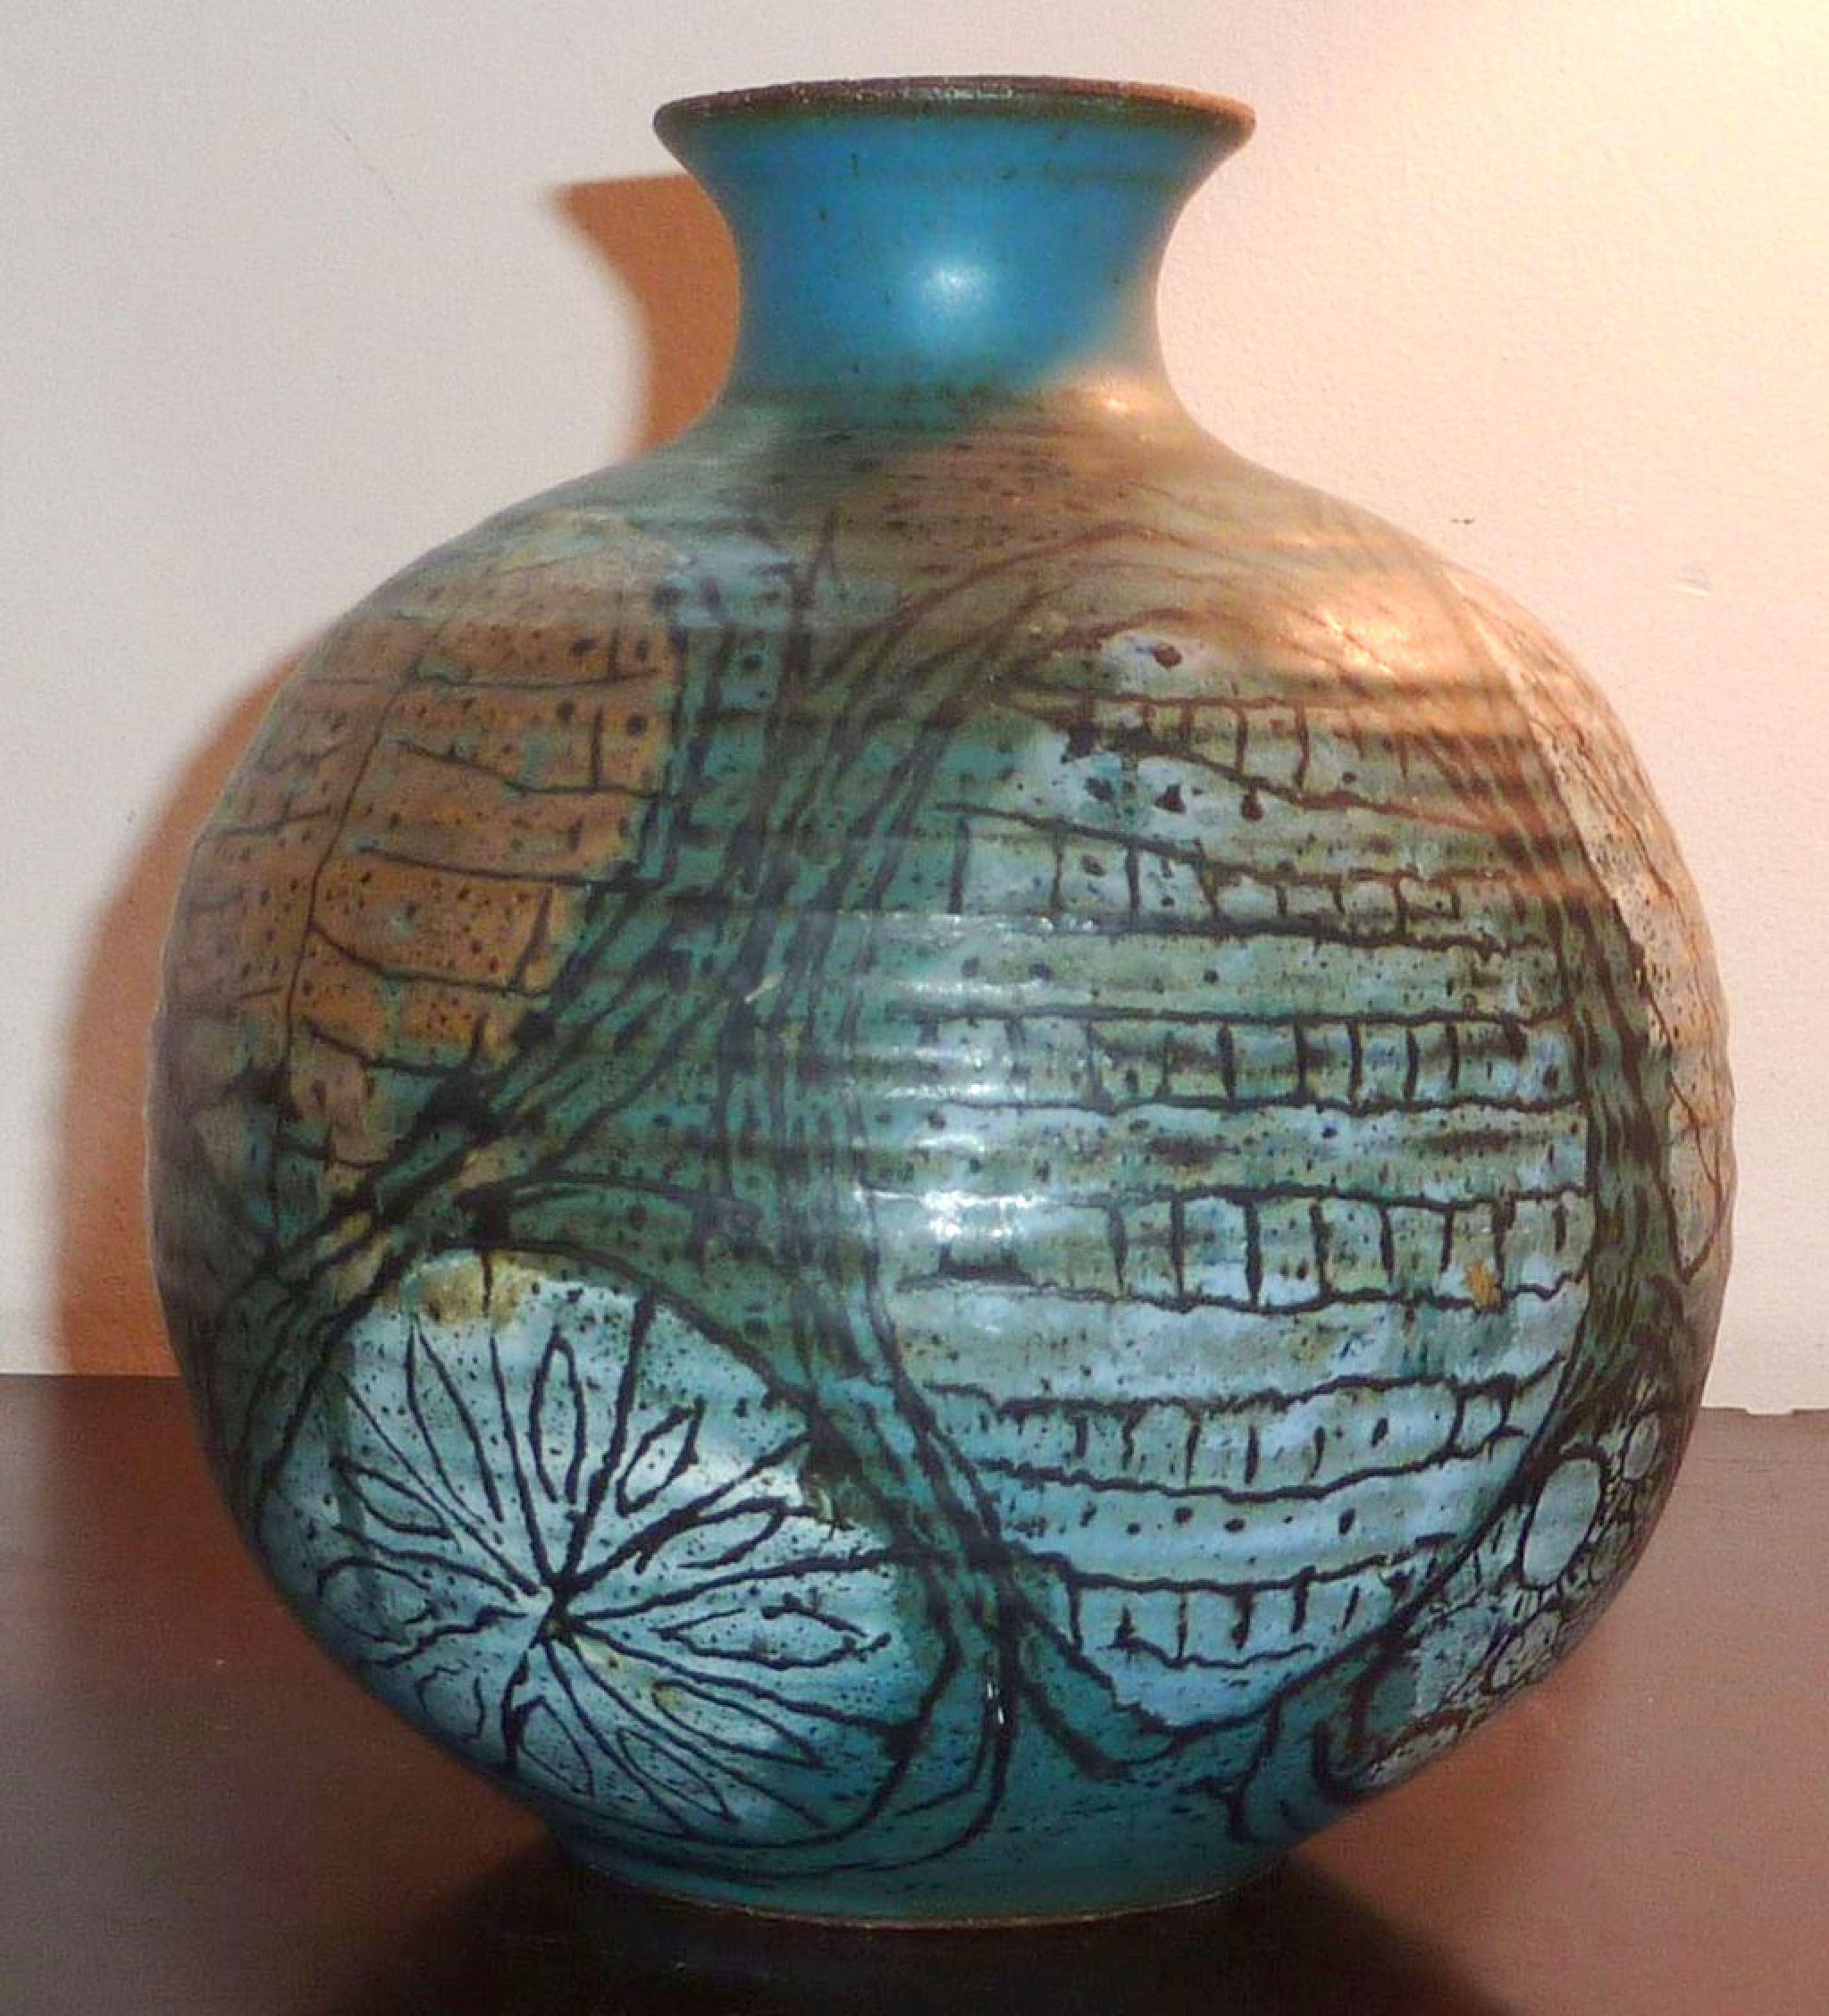 Frank matranga studios mid century stoneware vase studio pottery pottery frank matranga studios mid century stoneware vase reviewsmspy